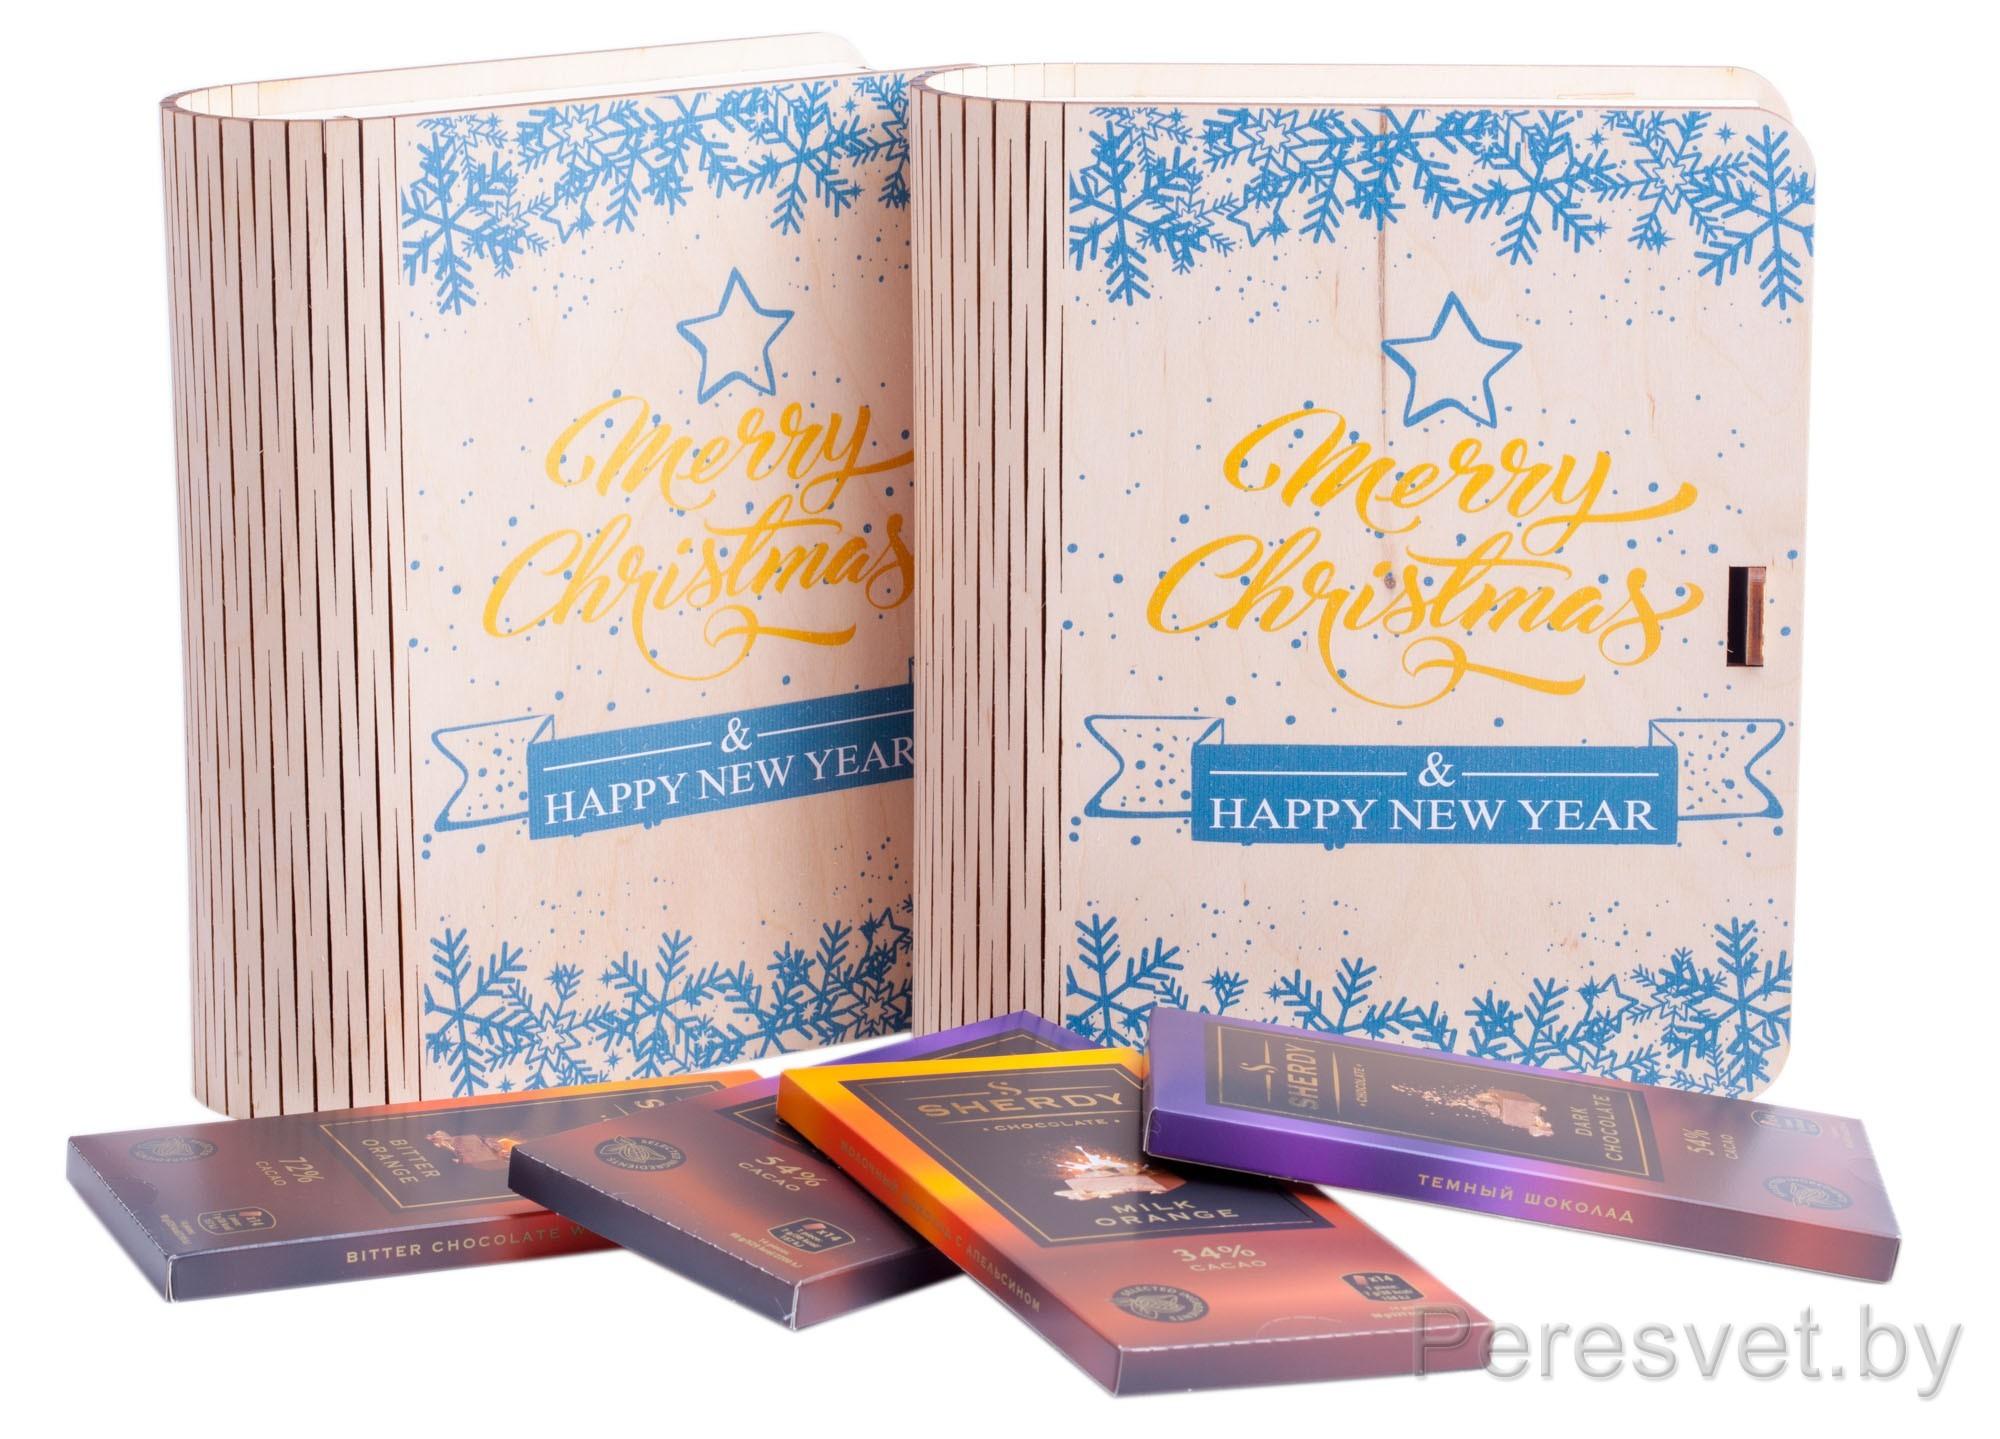 Праздничная упаковка Merry Christmas шоколадное настроение на peresvet.by